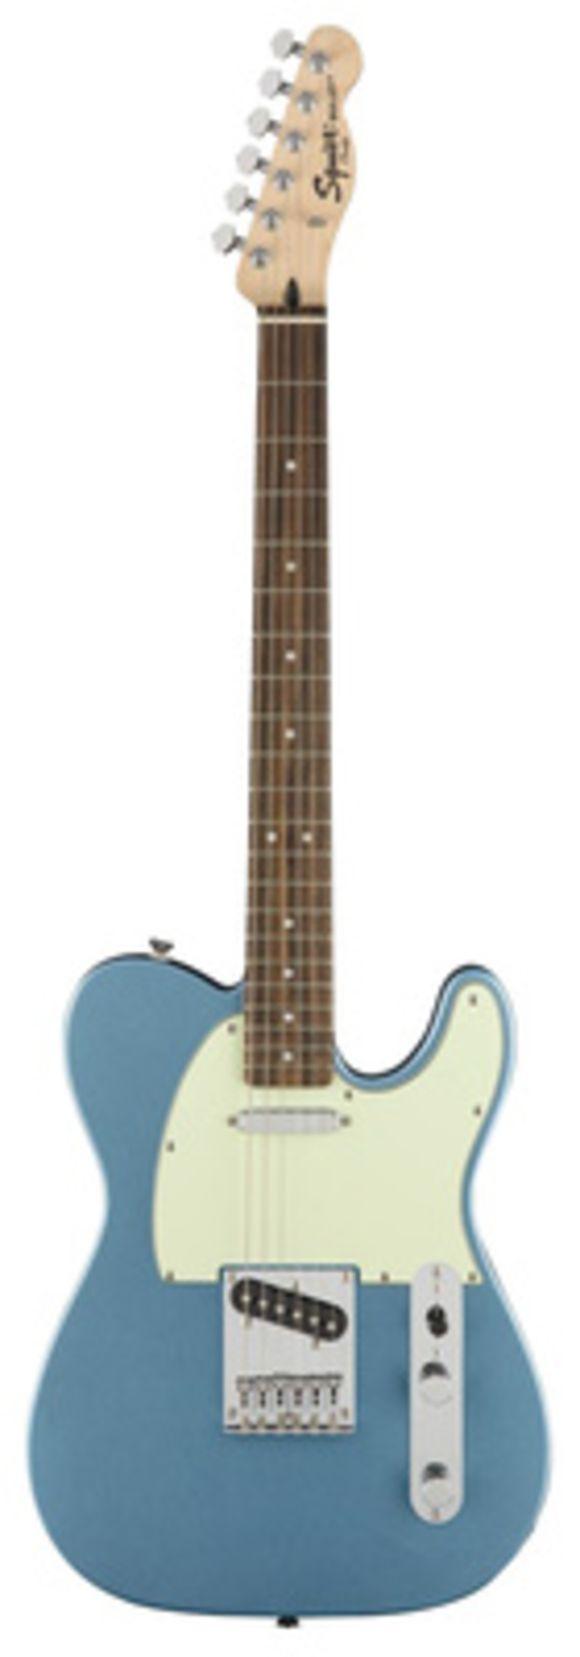 SQ Bullet Tele LRL LPB Fender